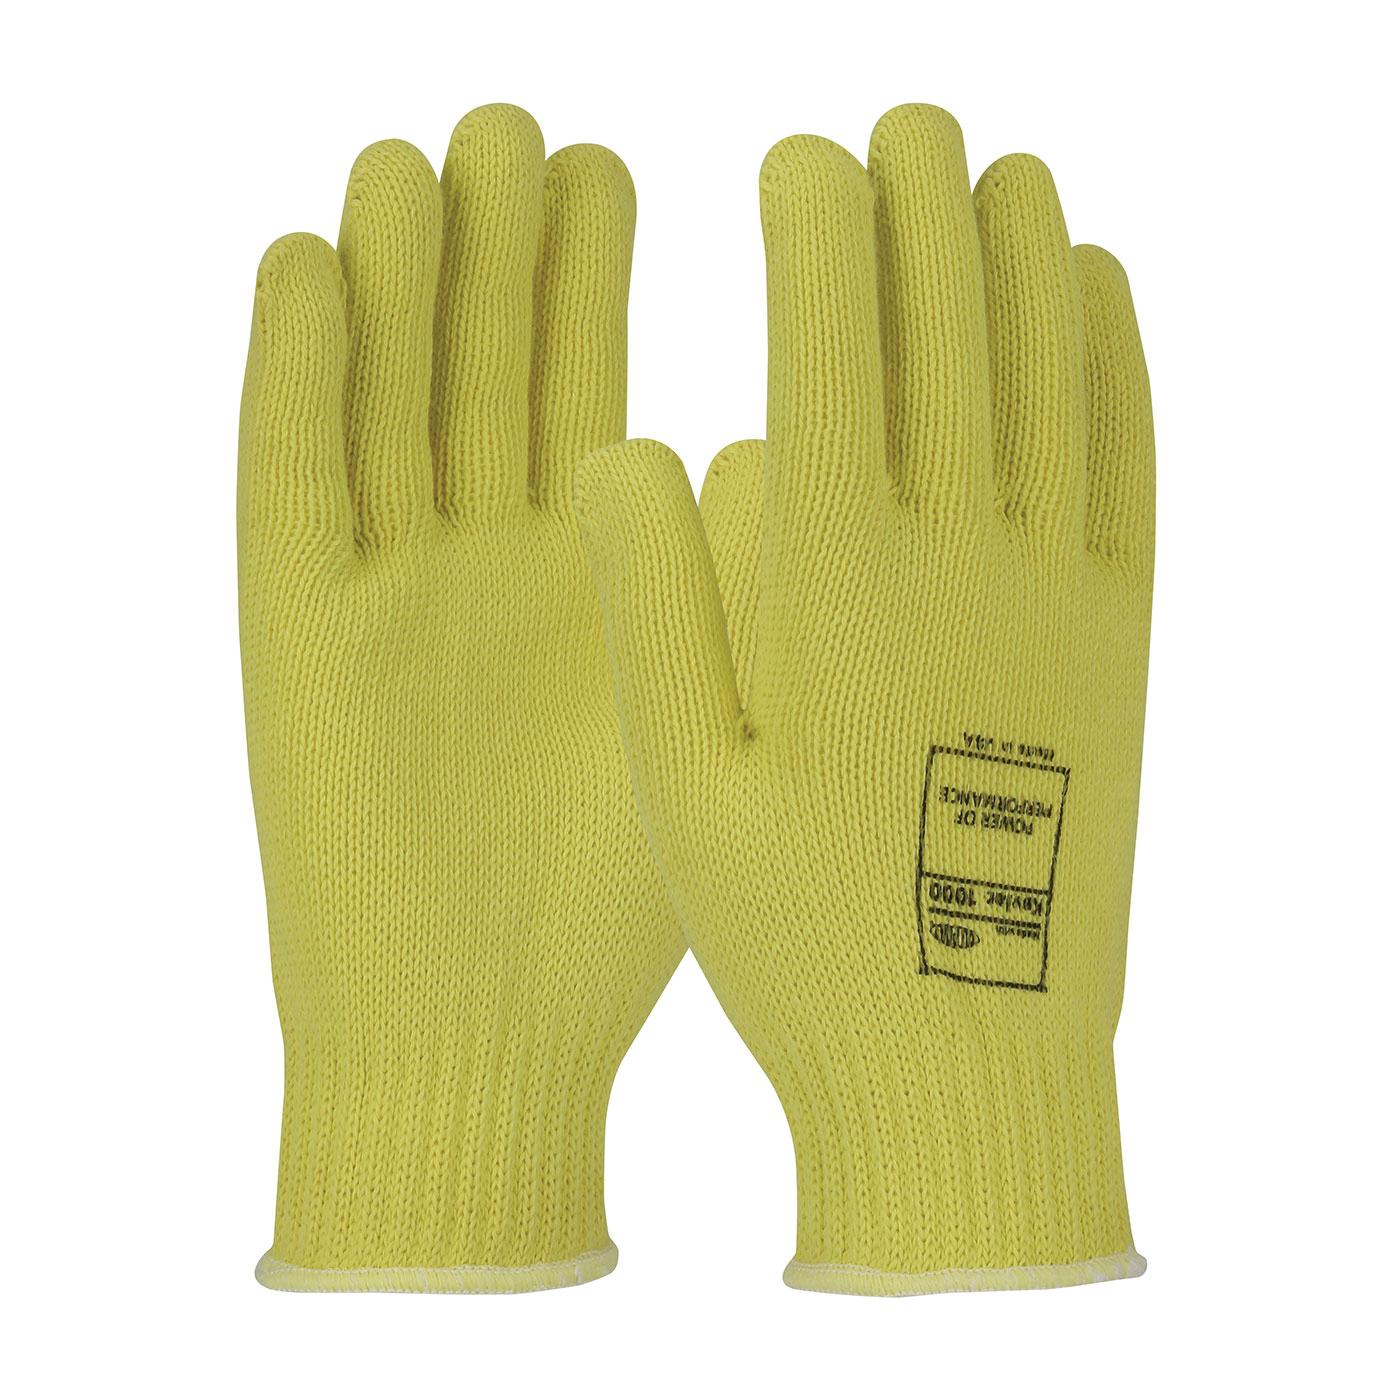 PIP® Kut-Gard® 07-K200/L Lightweight Unisex Cut Resistant Gloves, L, Uncoated Coating, DuPont™ Kevlar® Fiber, Elastic/Knit Wrist Cuff, Resists: Cut, Heat and Flame, ANSI Cut-Resistance Level: A2